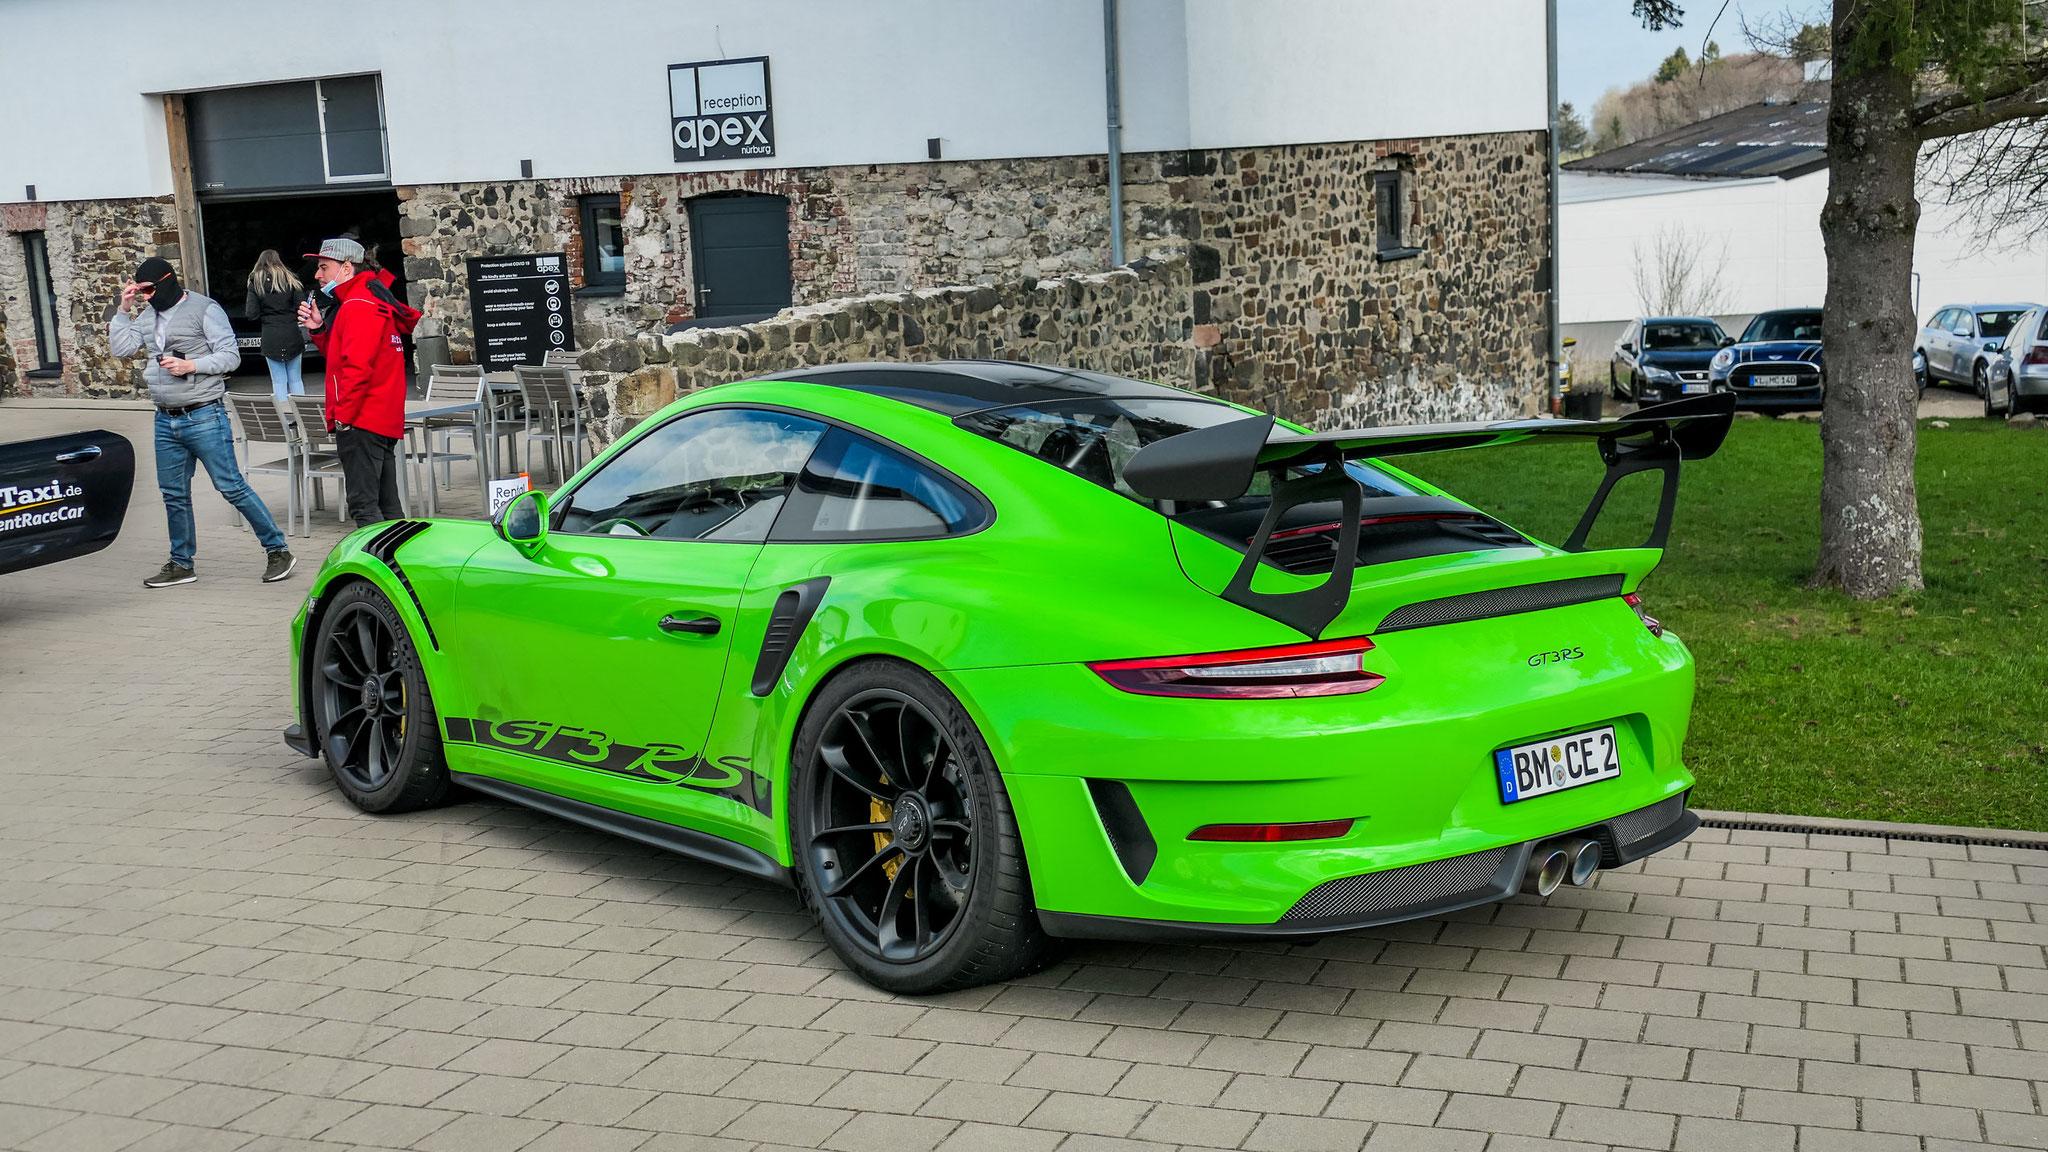 Porsche 911 991.2 GT3 RS - BM-CE-2